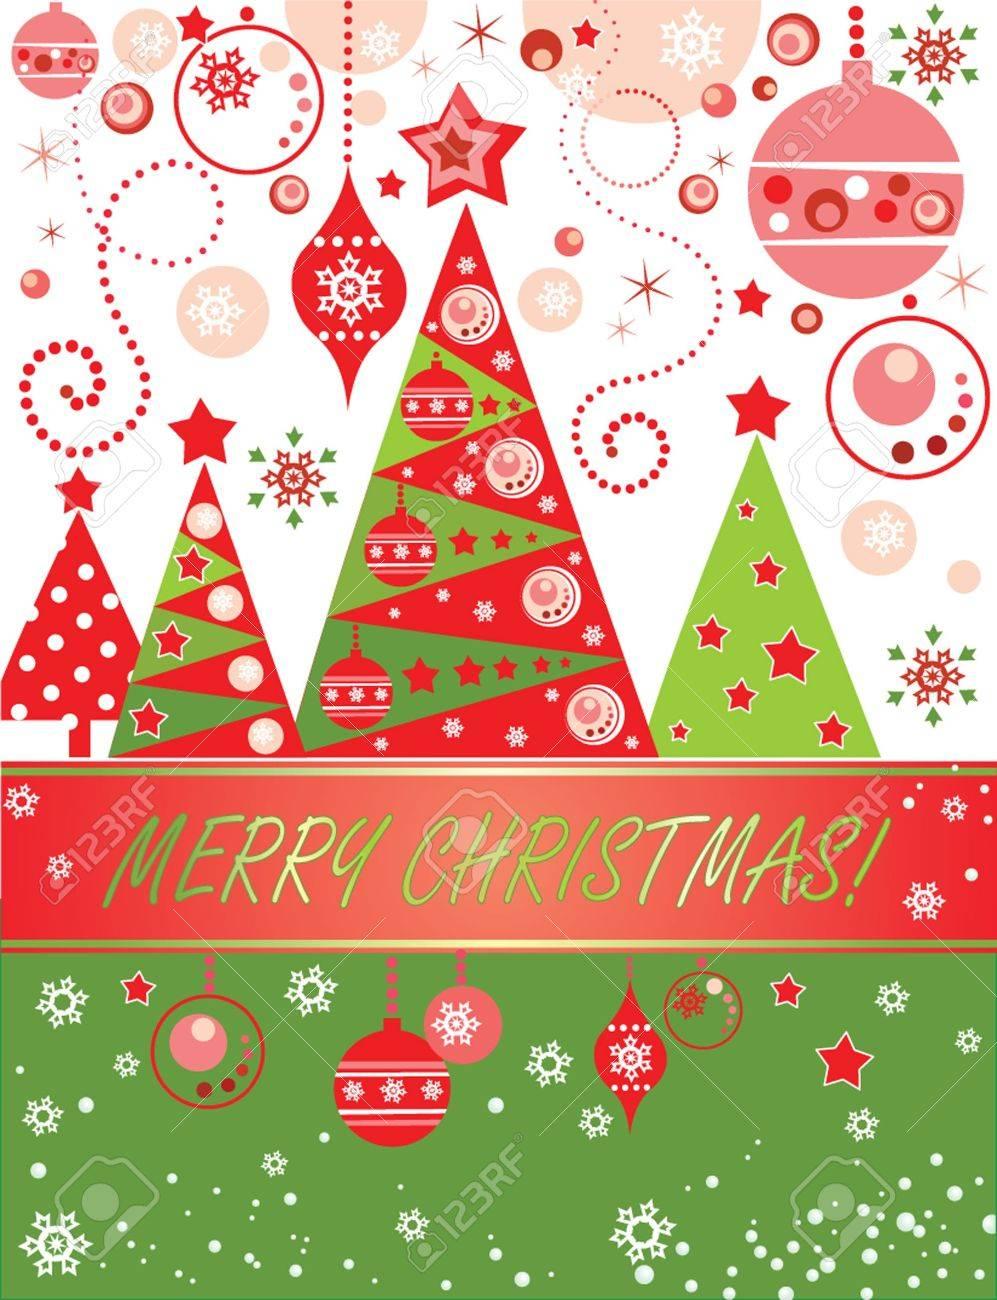 Christmas card Stock Vector - 18921566